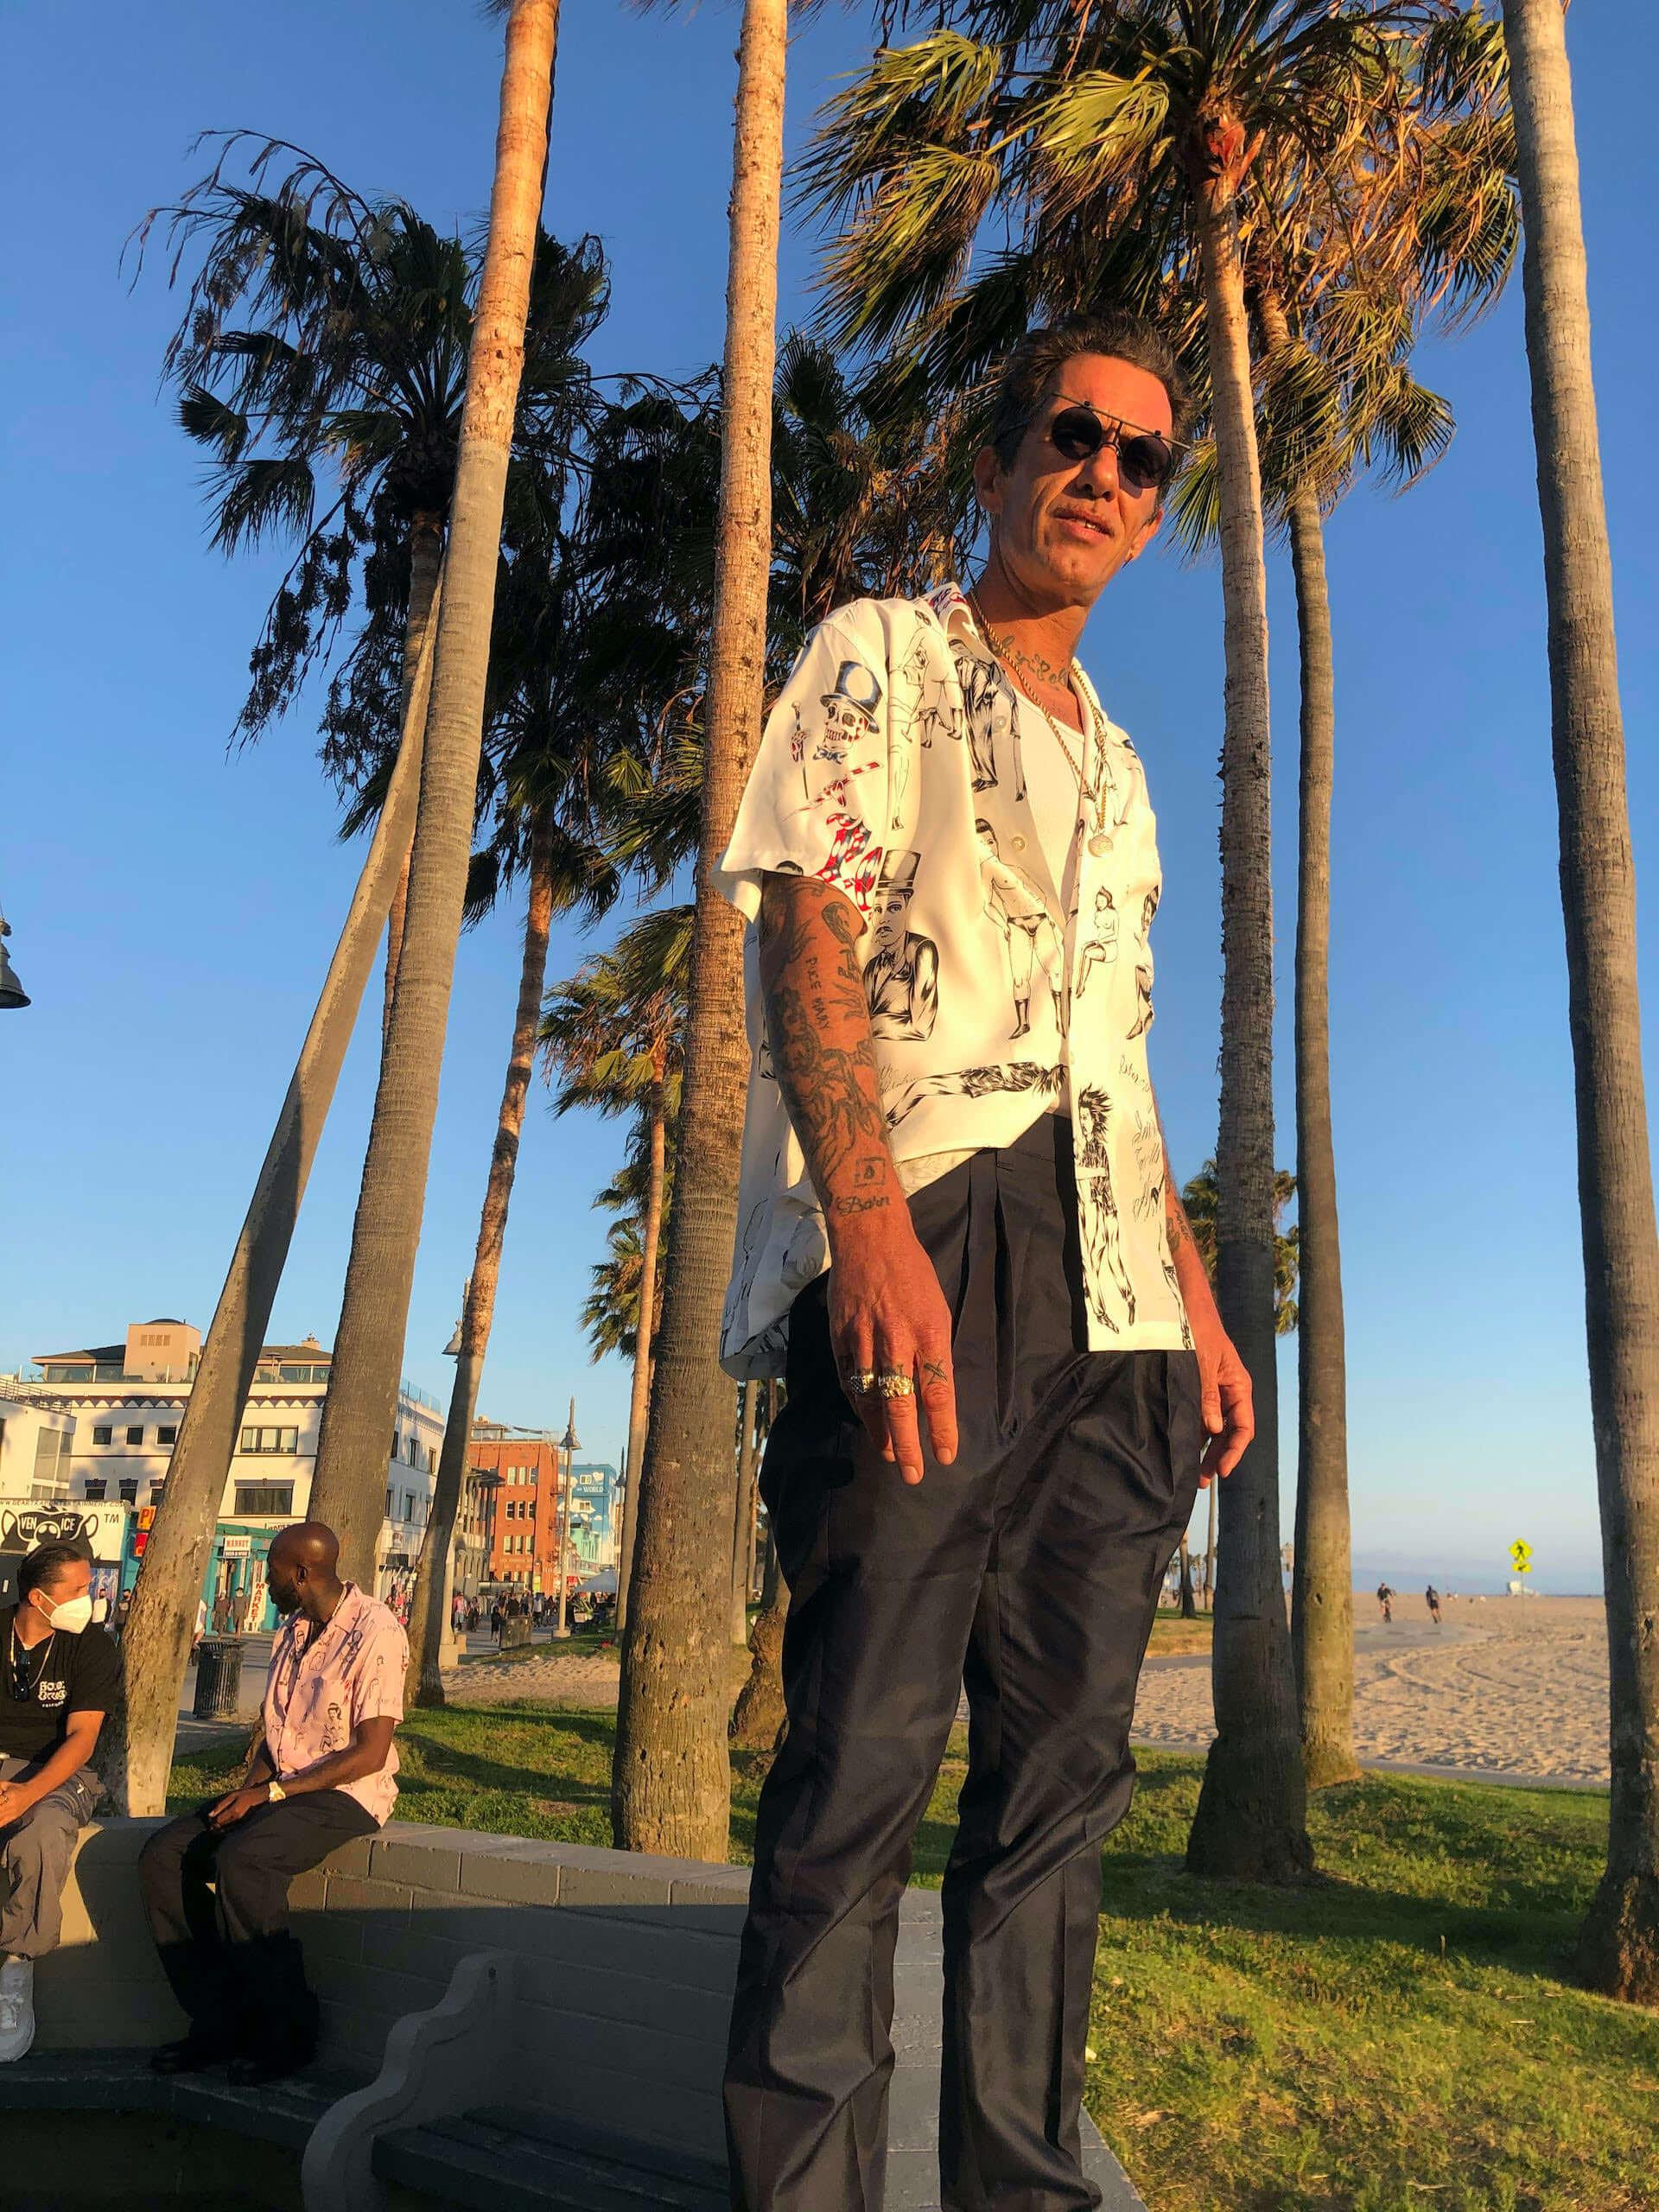 Kanye Westにも作品提供するCali Thornhill DeWittの展覧会<TOKYO OLYMPICS>がGALLERY COMMONにて明日開幕! art2000820_cali-thornhill-deWitt_16-1920x2560